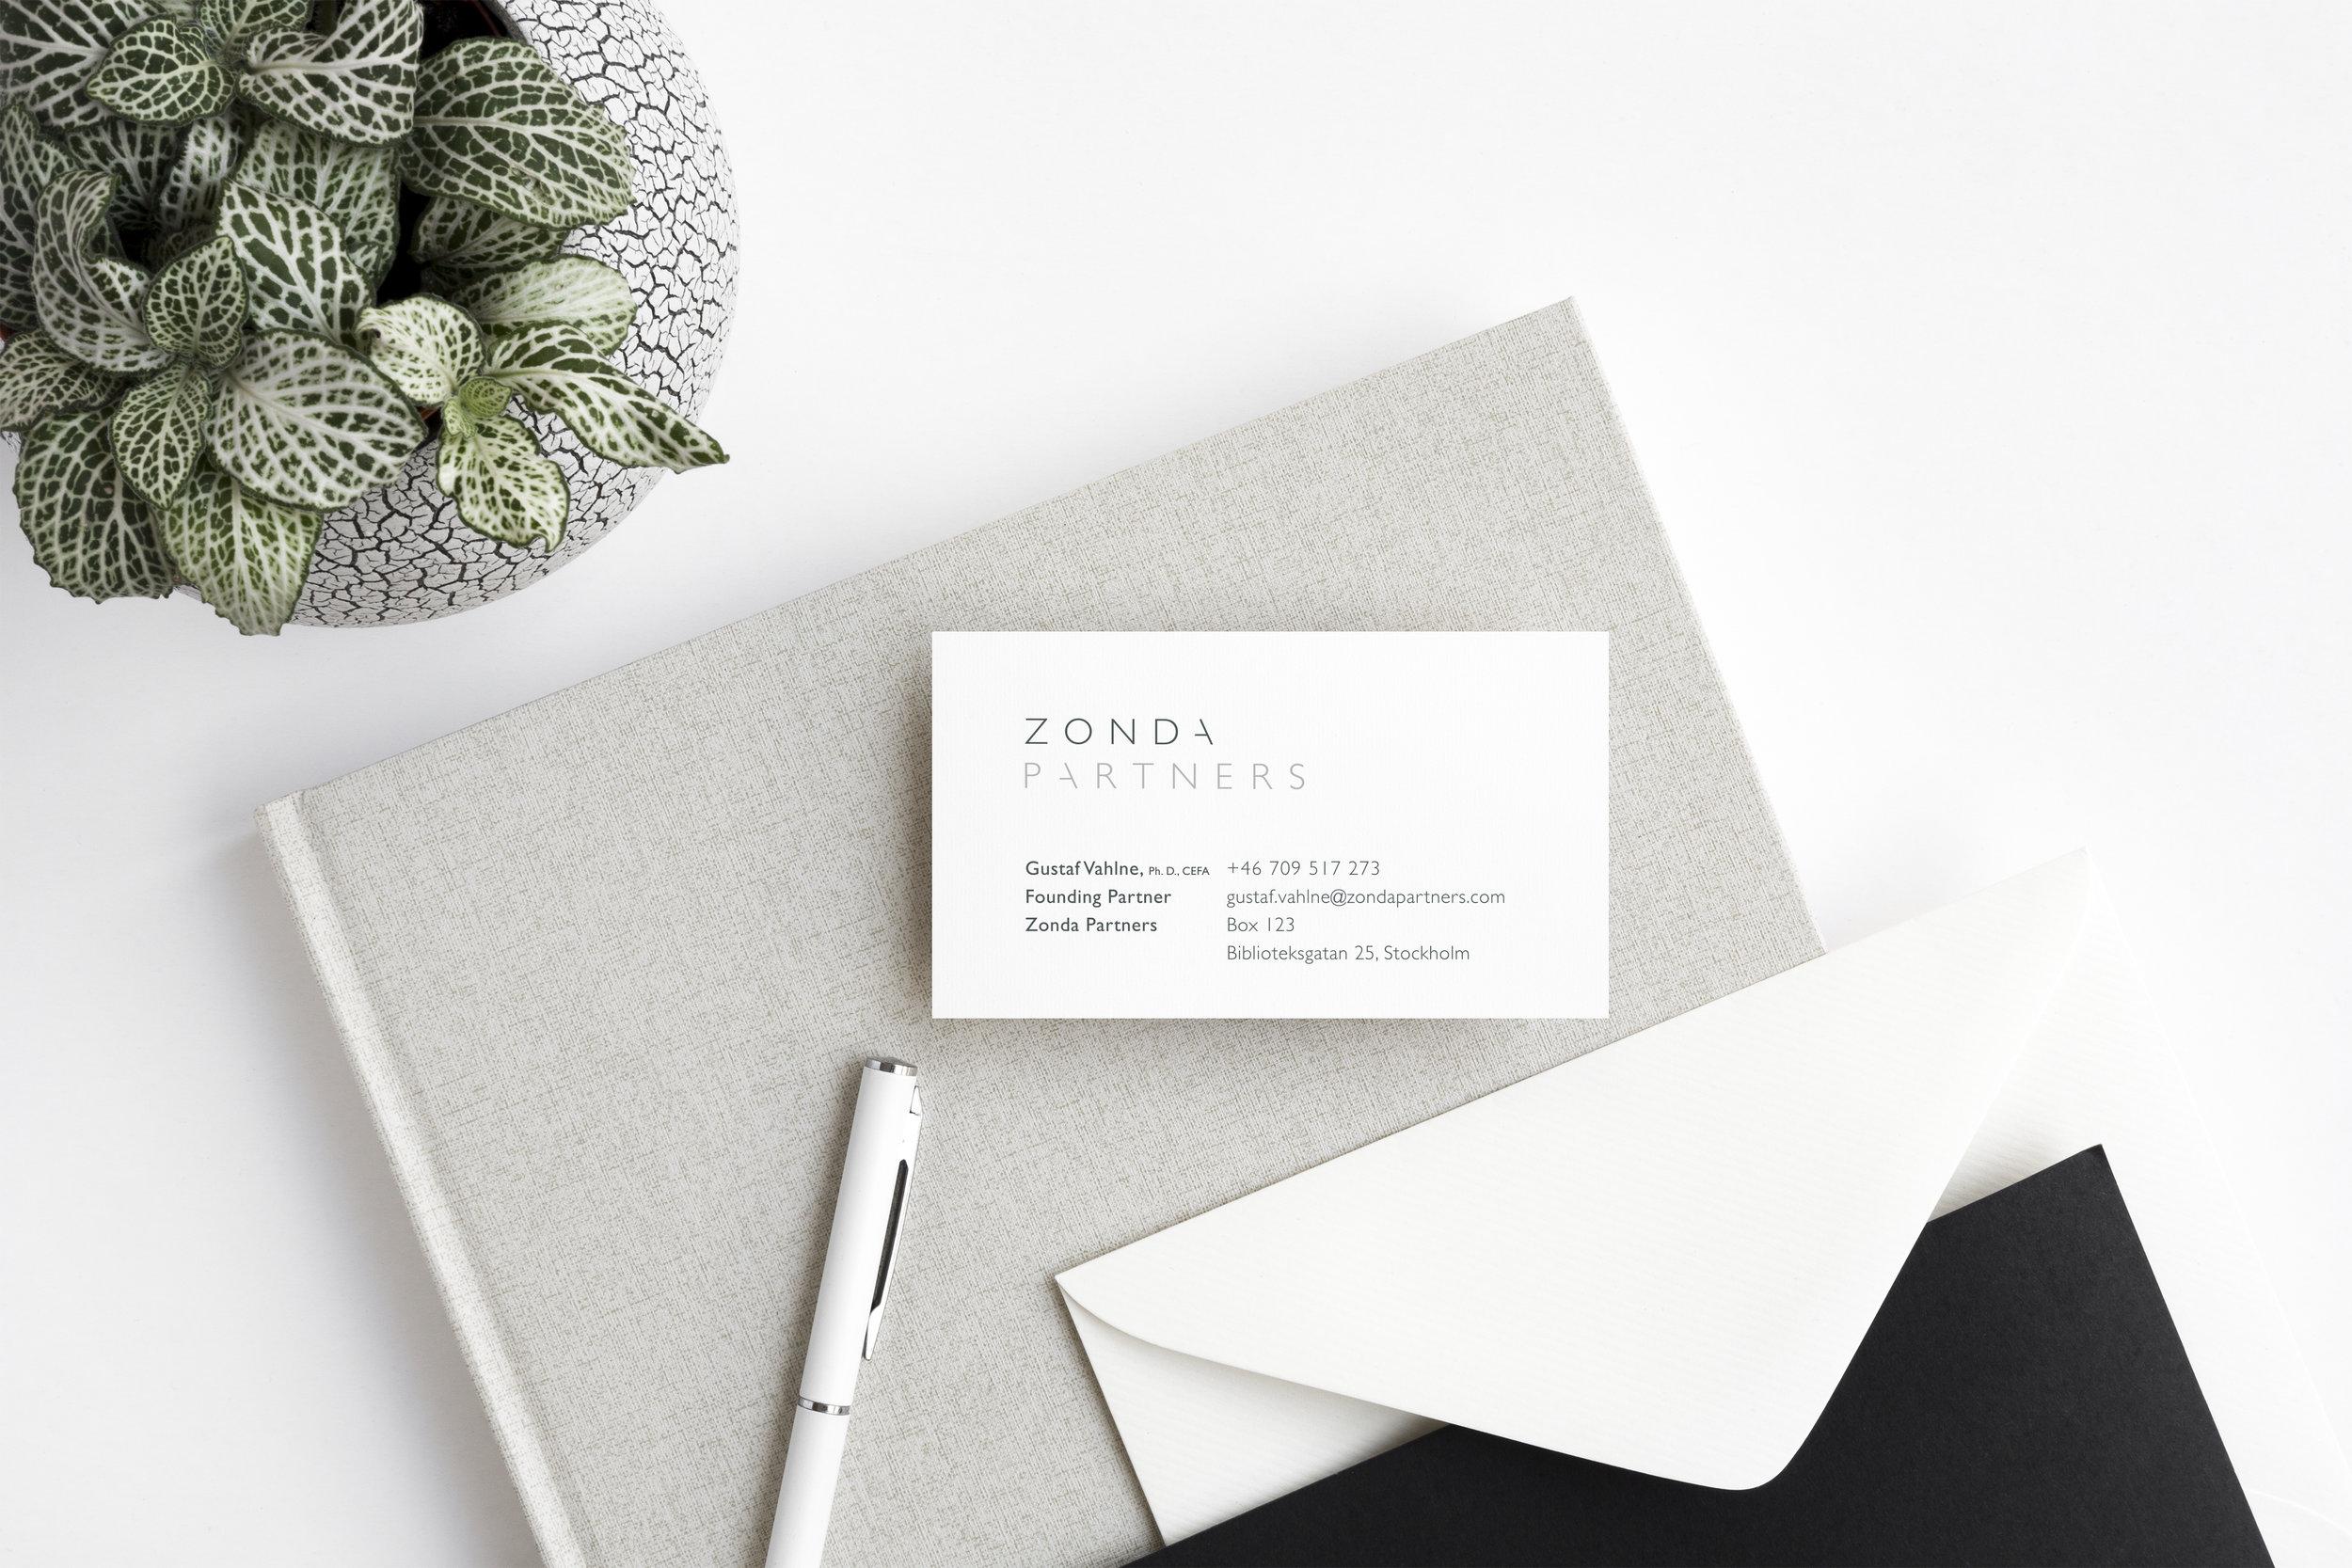 Zonda_Business card mock up.jpg